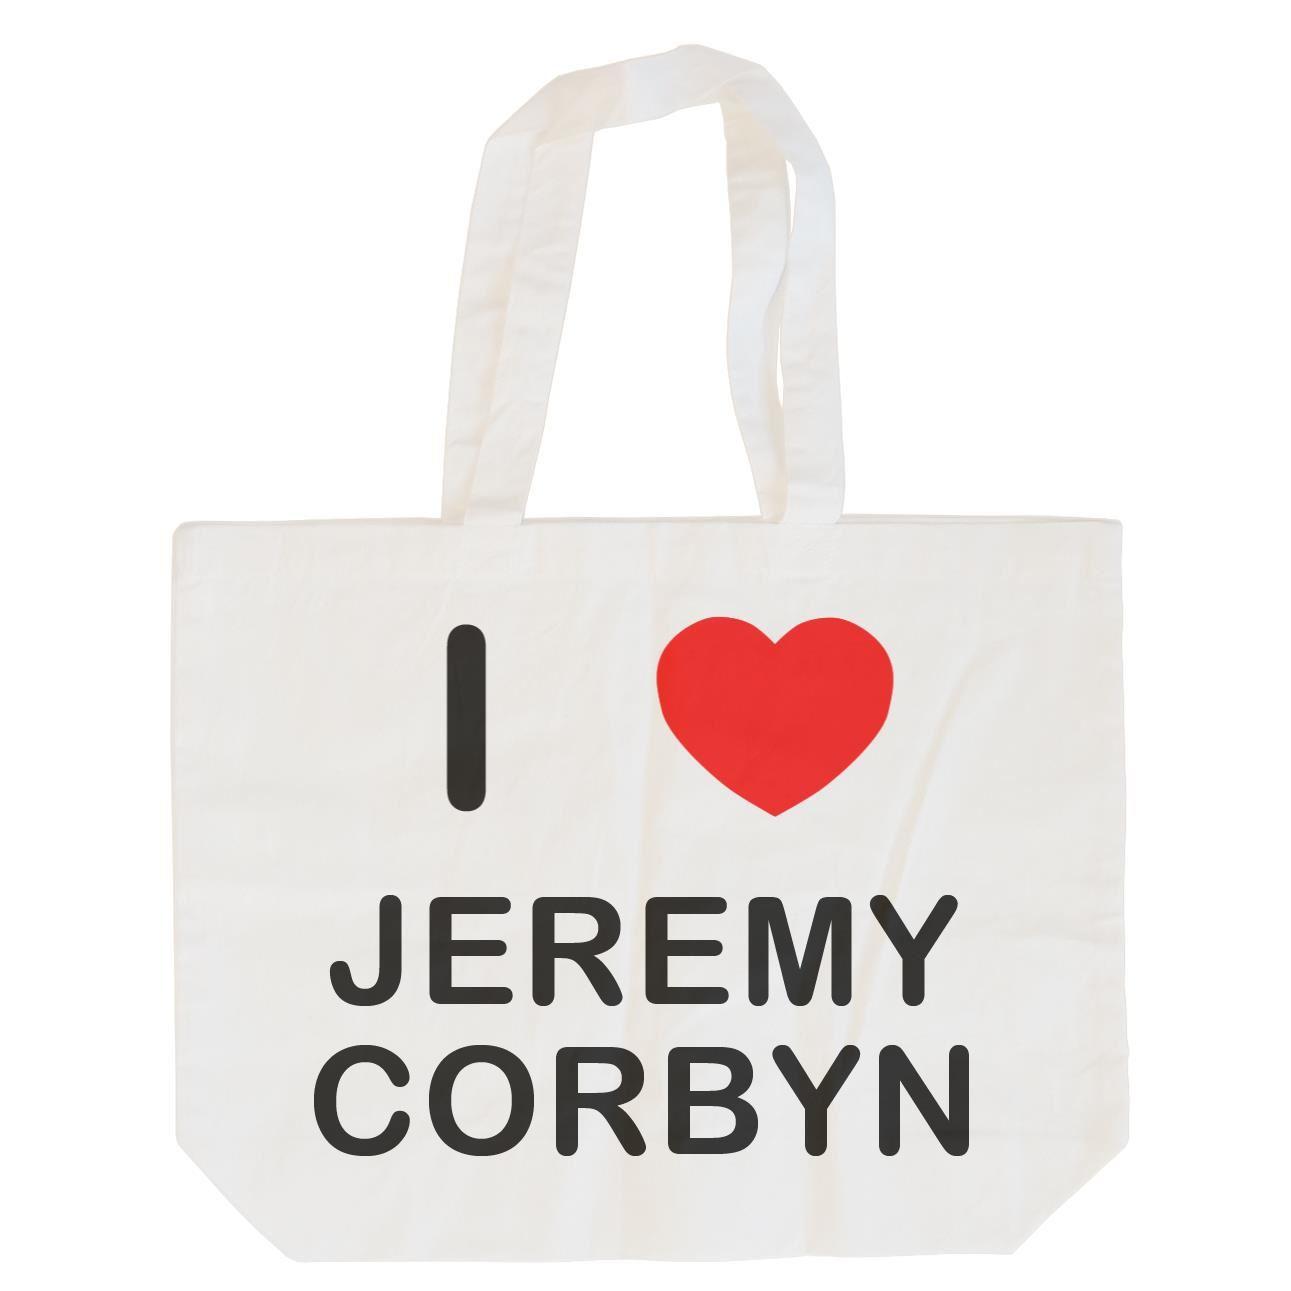 I Love Jeremy Corbyn - Cotton Bag | Size choice Tote, Shopper or Sling